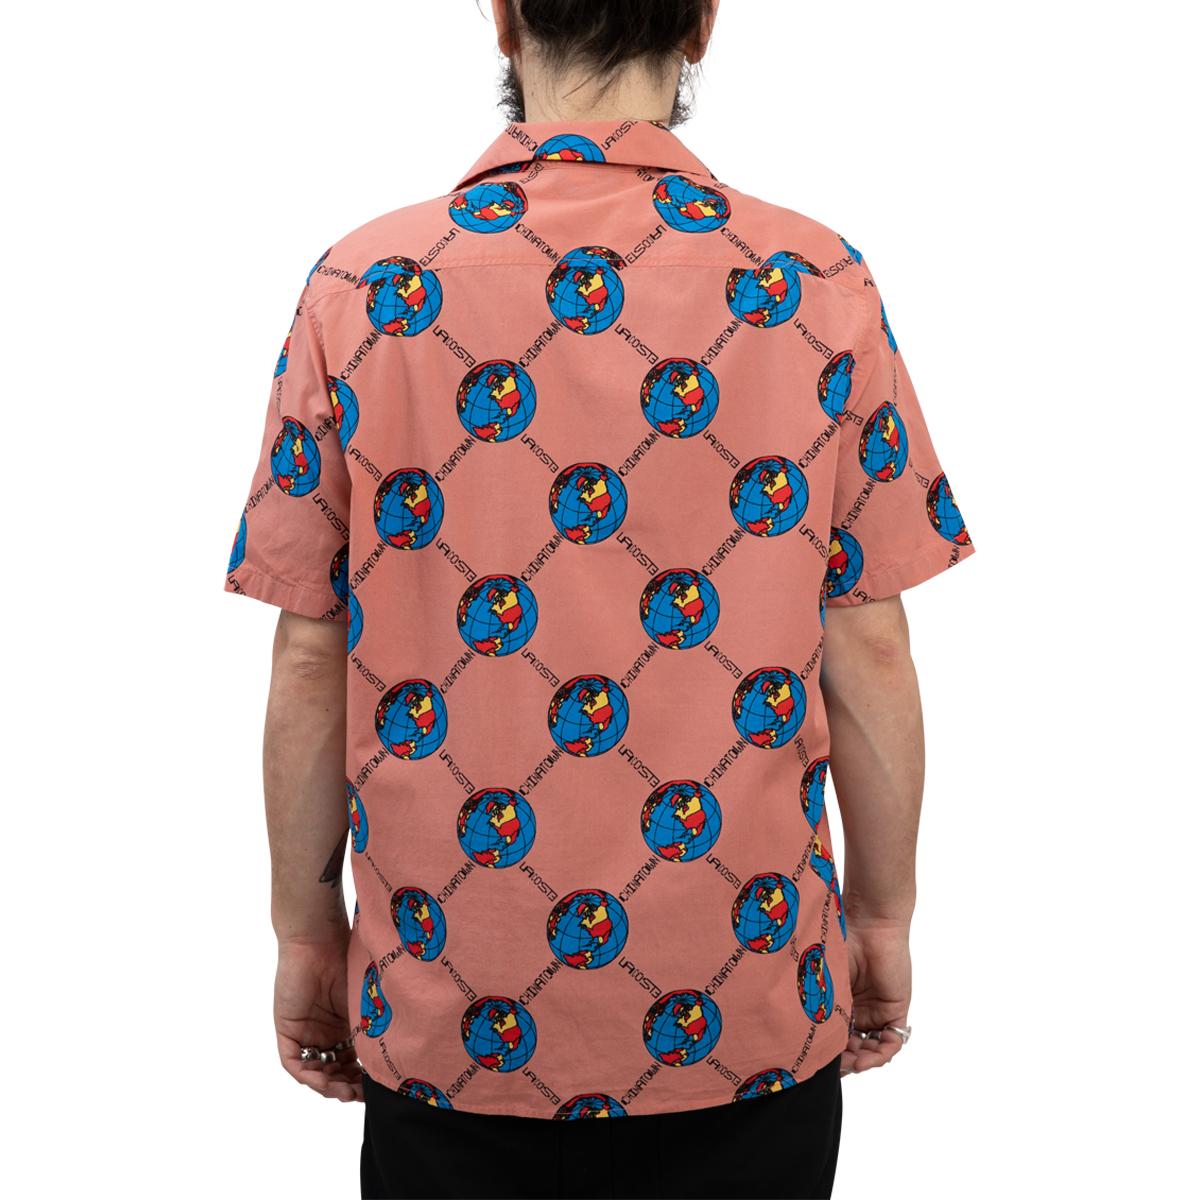 Lacoste X Chinatown Market Short Sleeve Shirt